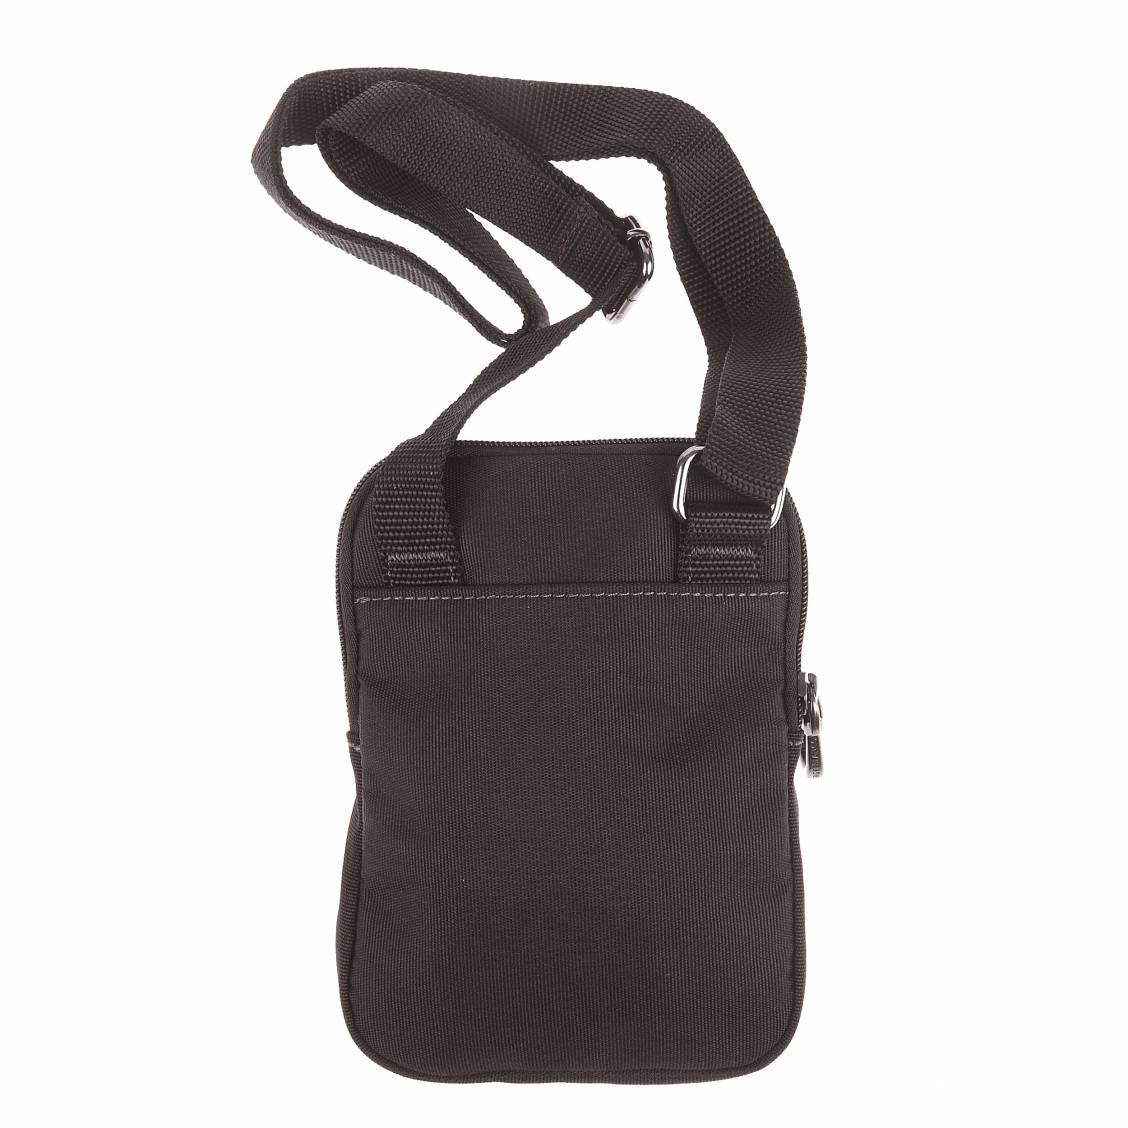 Petite sacoche plate Palatino Serge Blanco en tissu noir 83oFRz